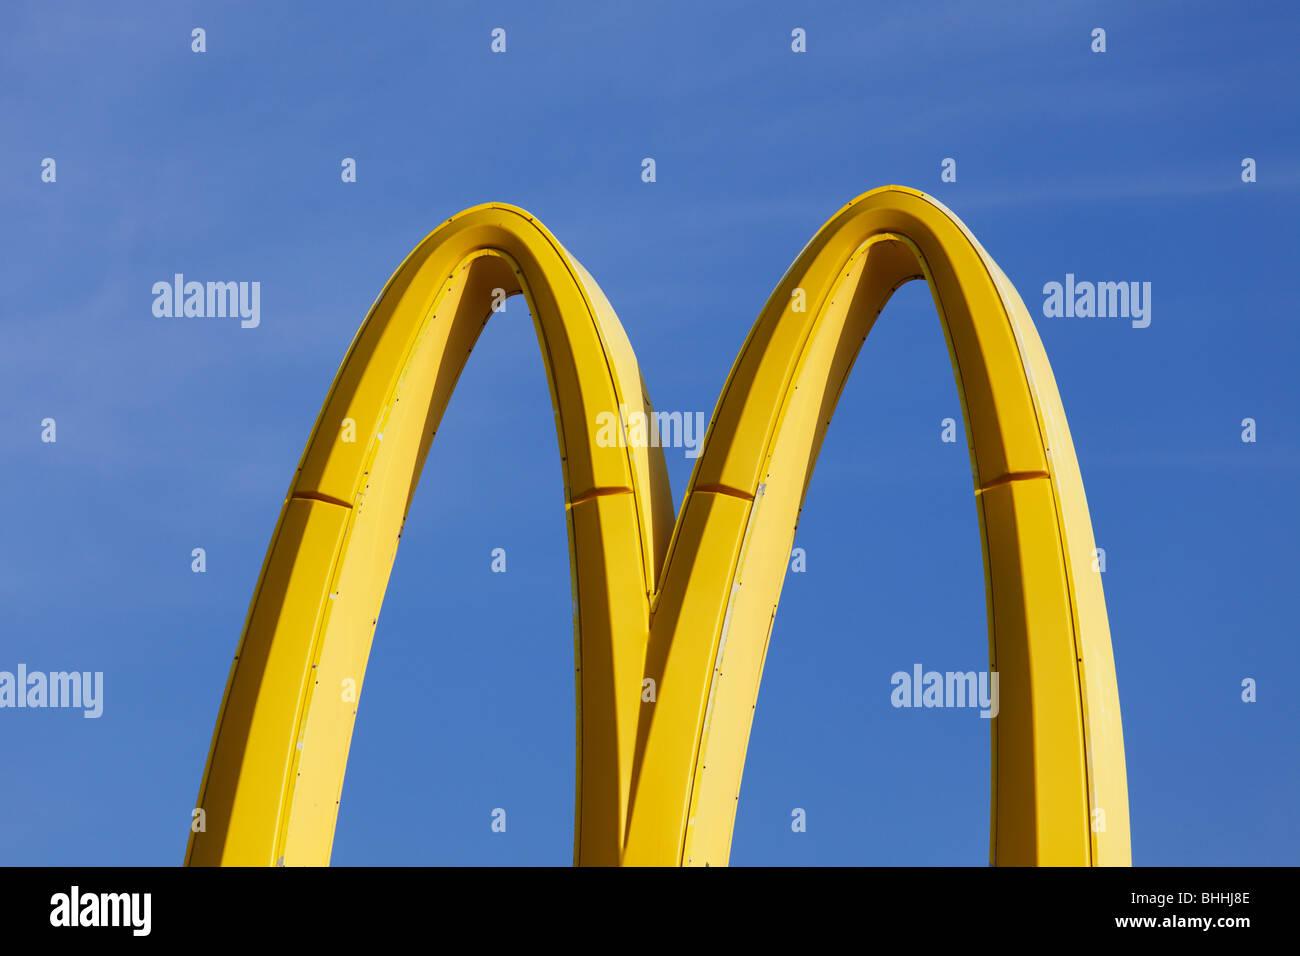 Mcdonalds advertisement stock photos mcdonalds for Mcdonalds norwich ny